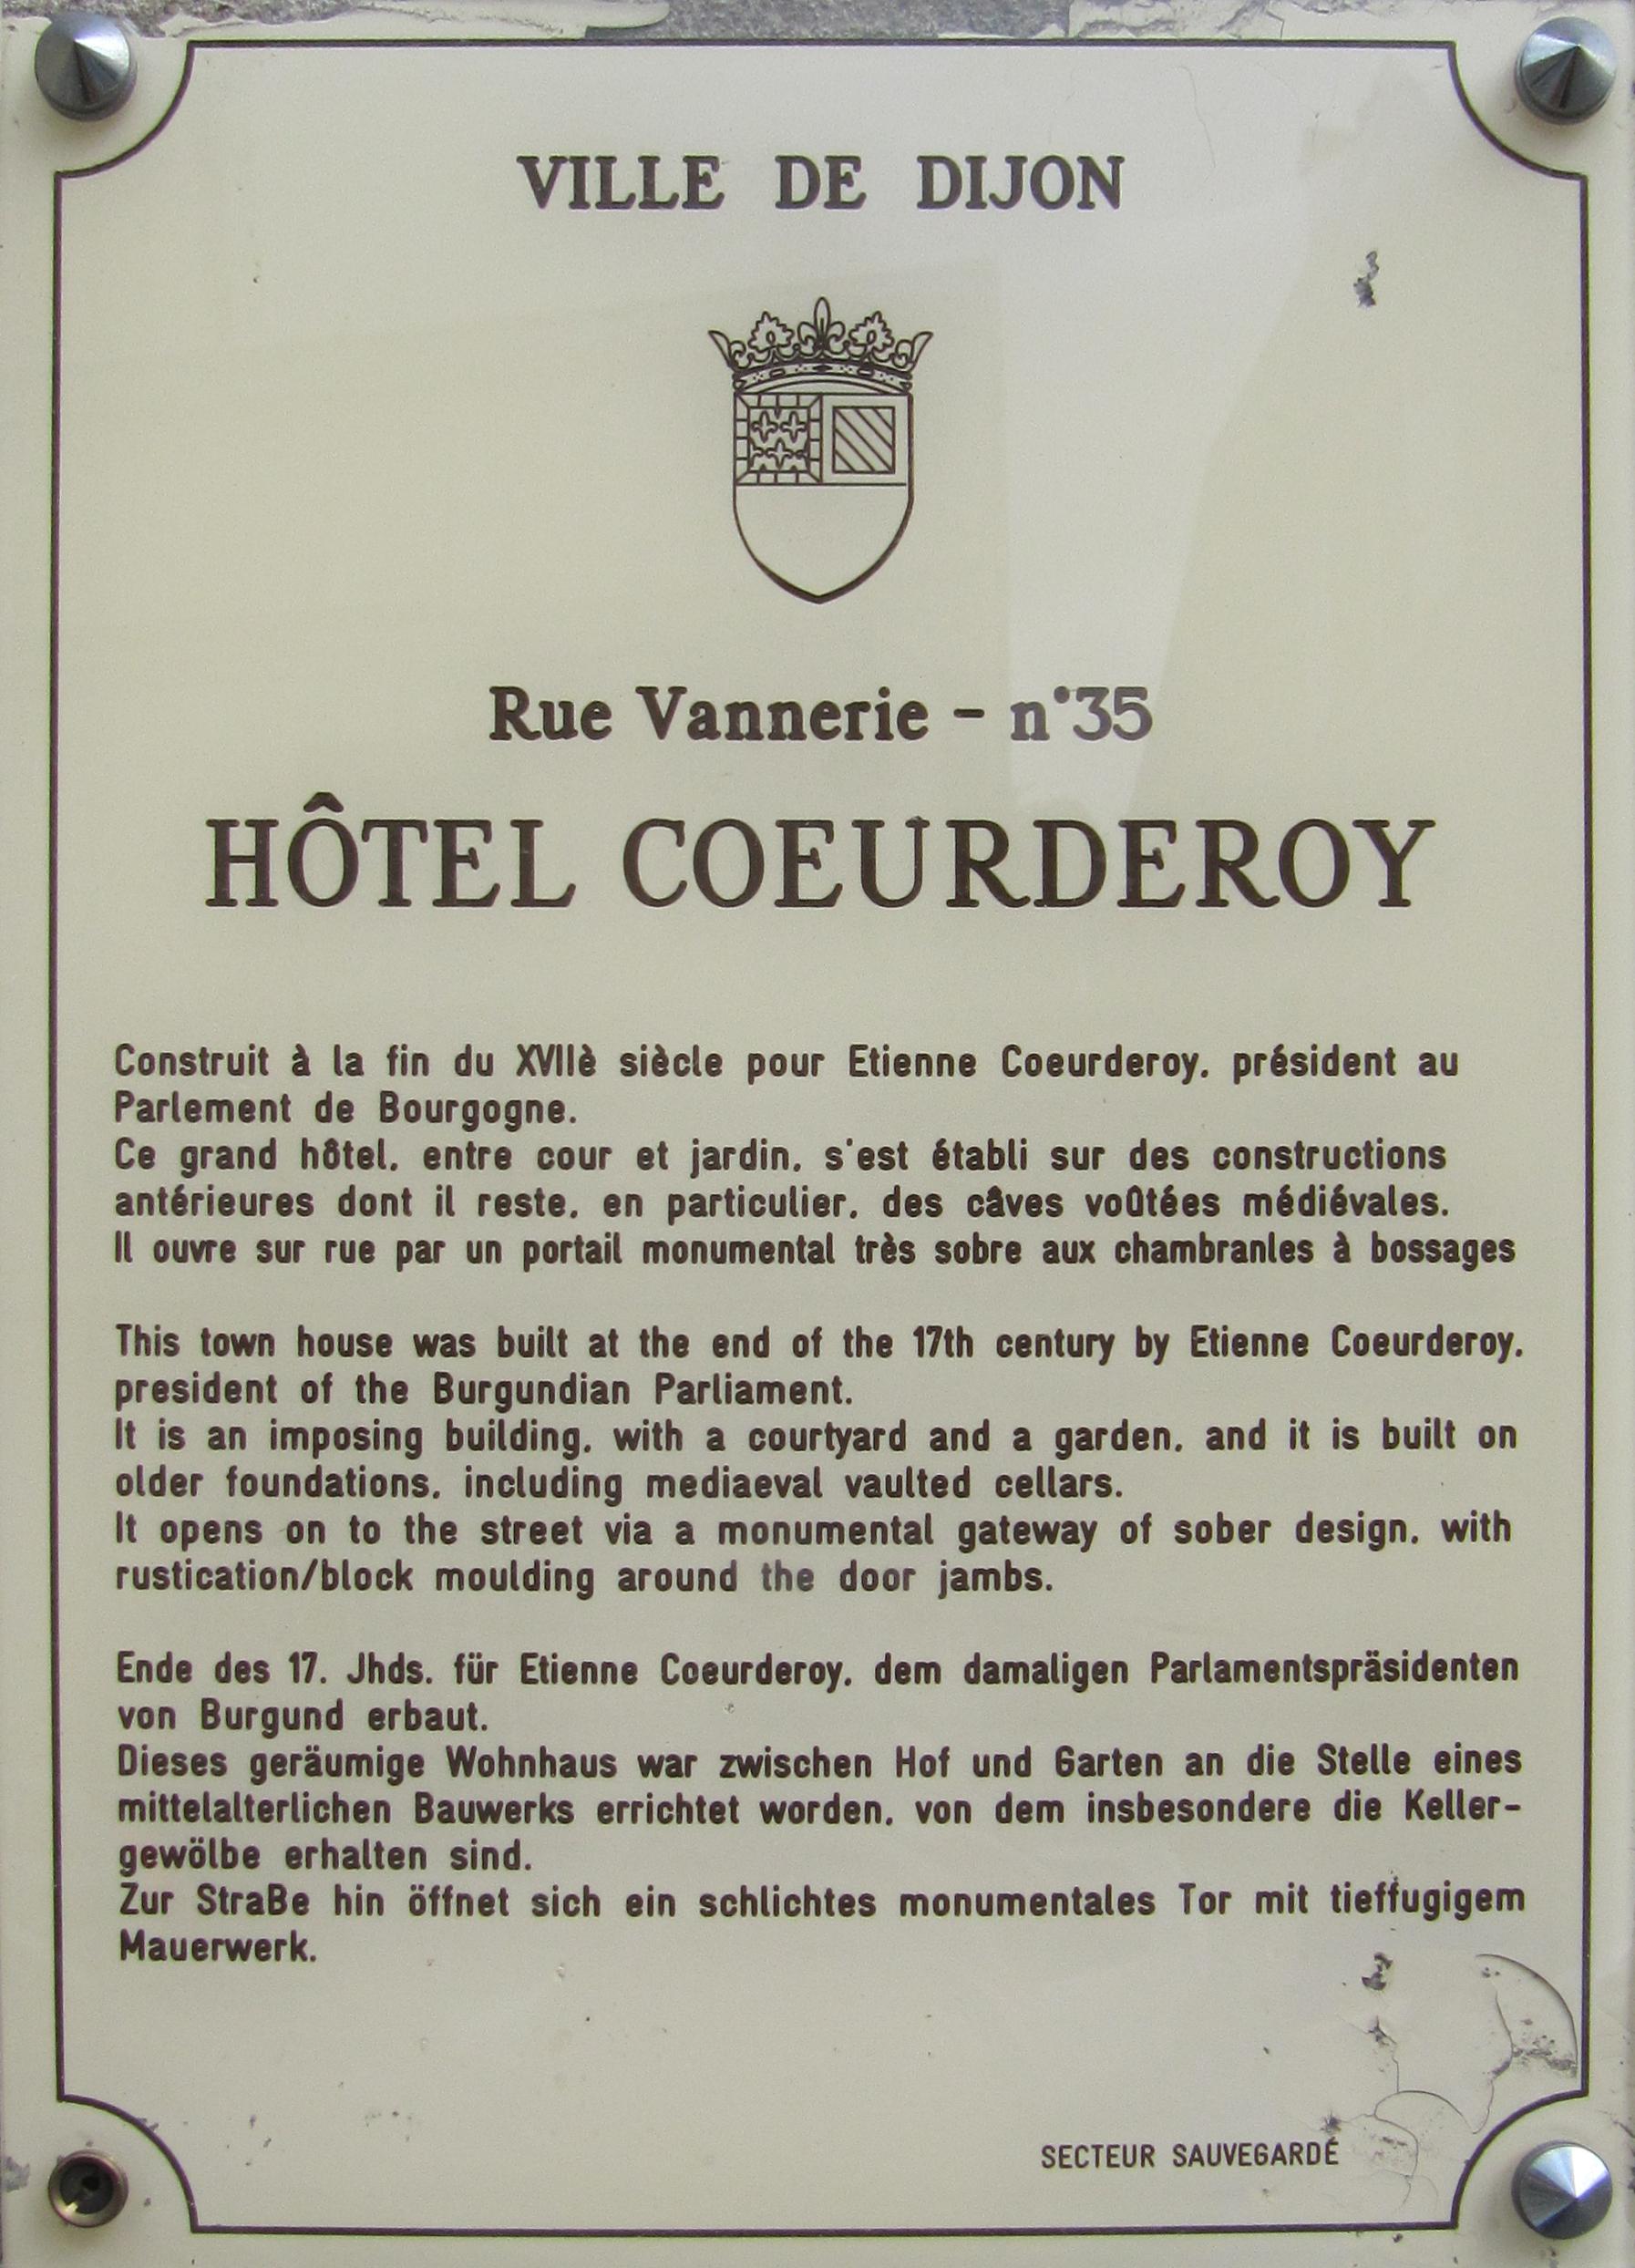 File Dijon Hotel Coeurderoy plaque information